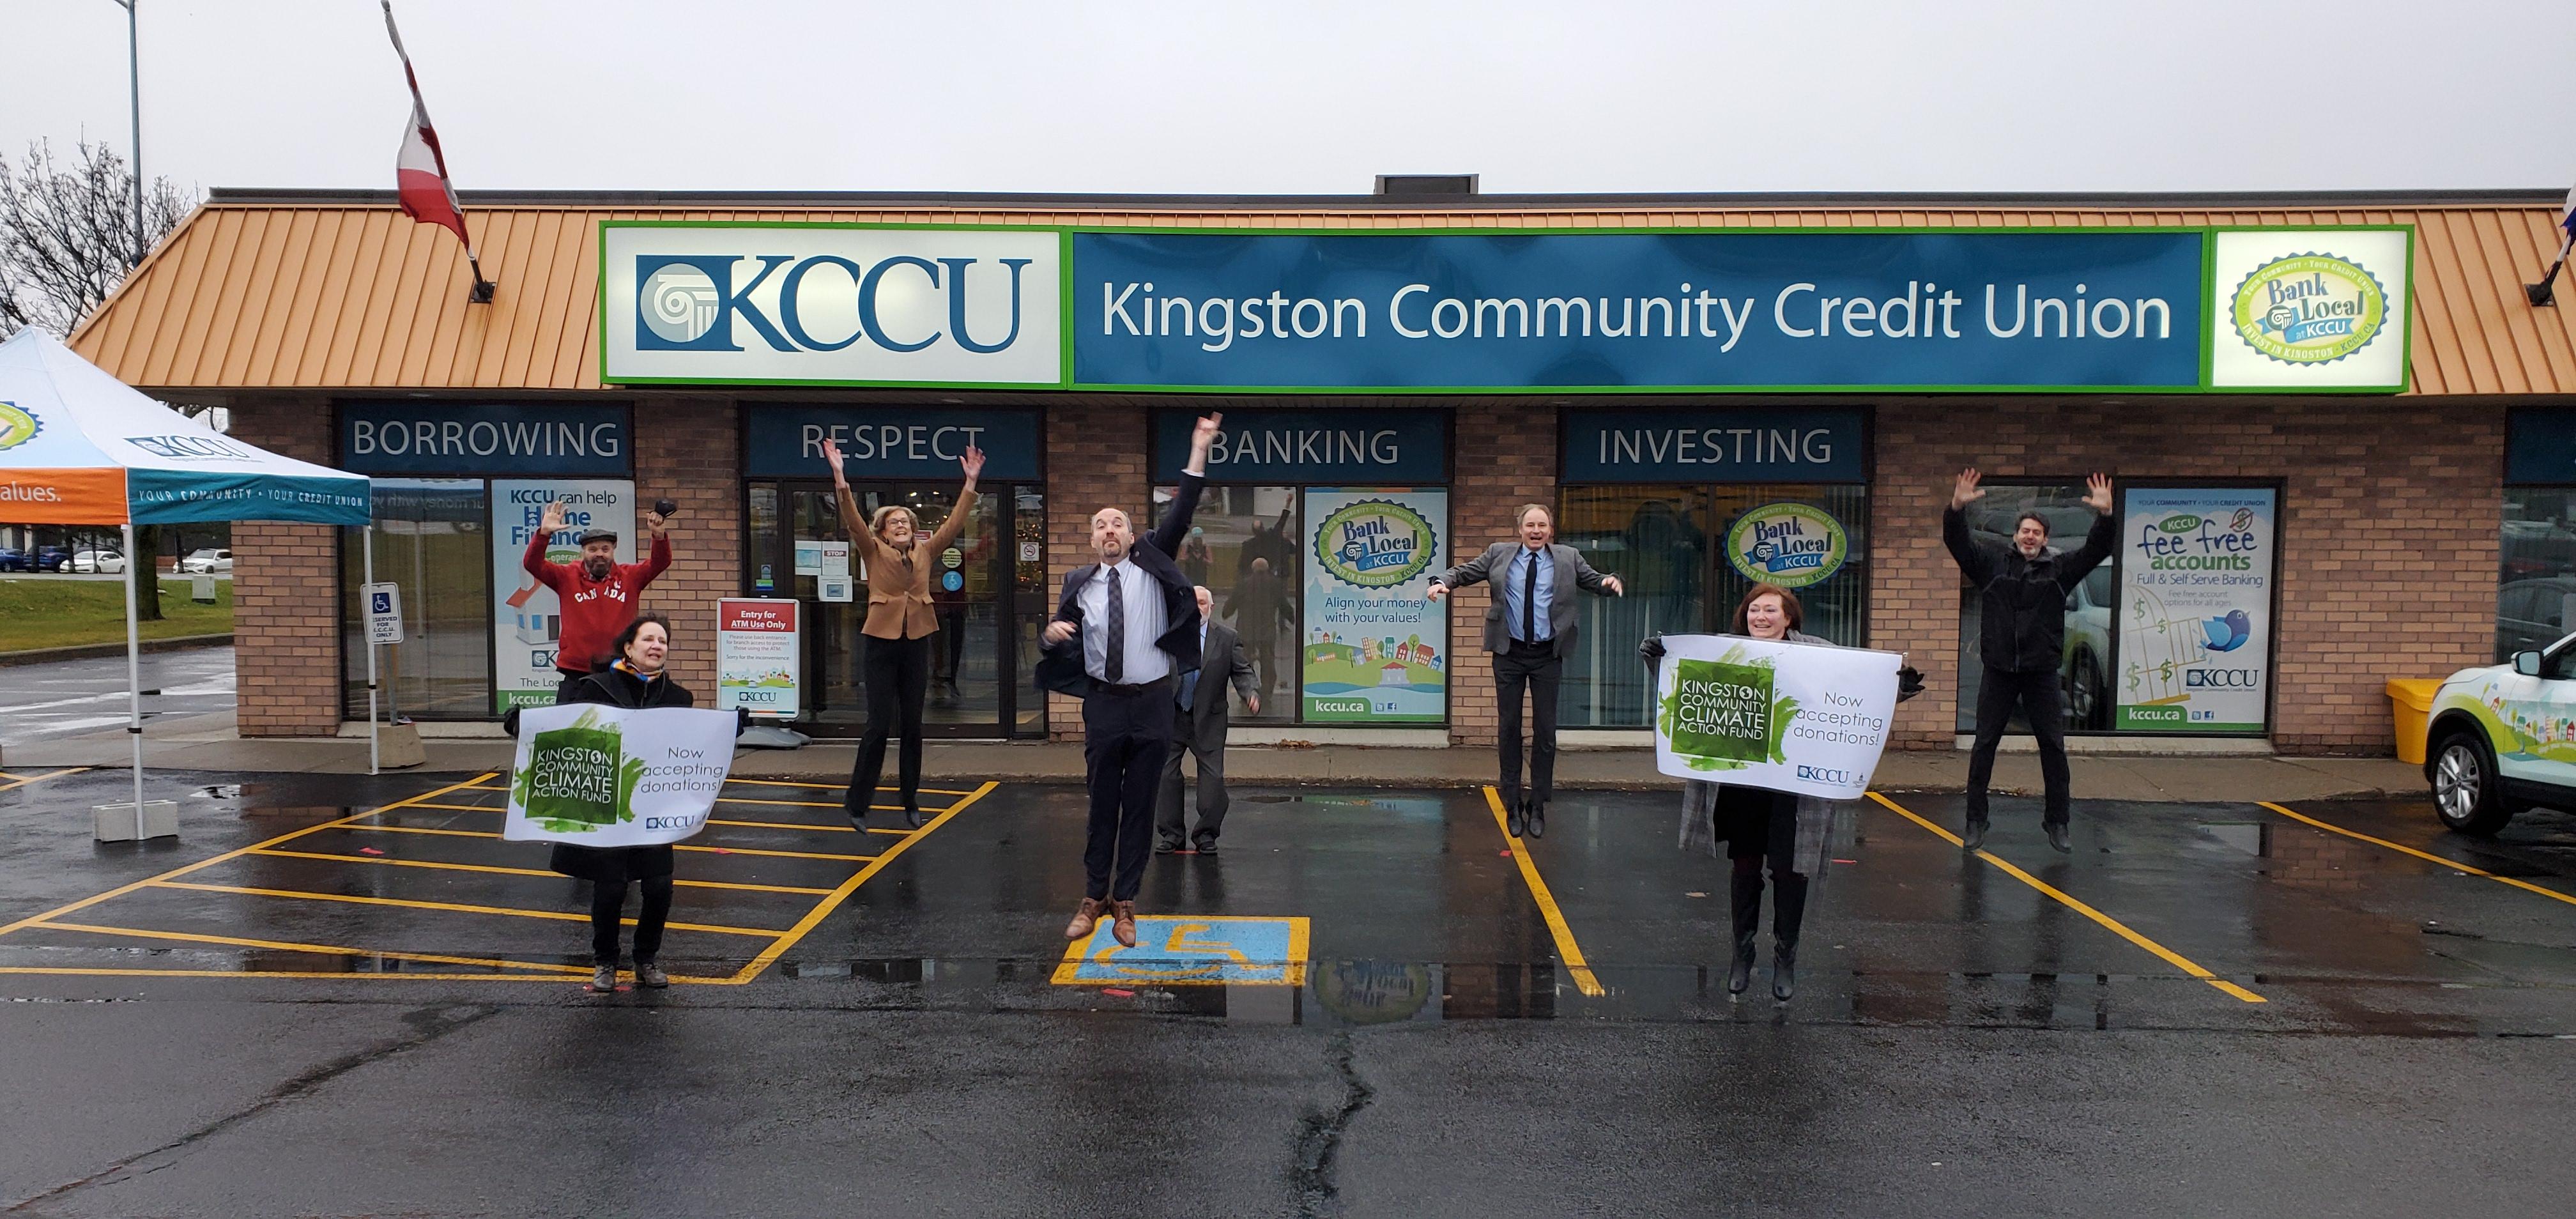 Kingston Community Credit Union